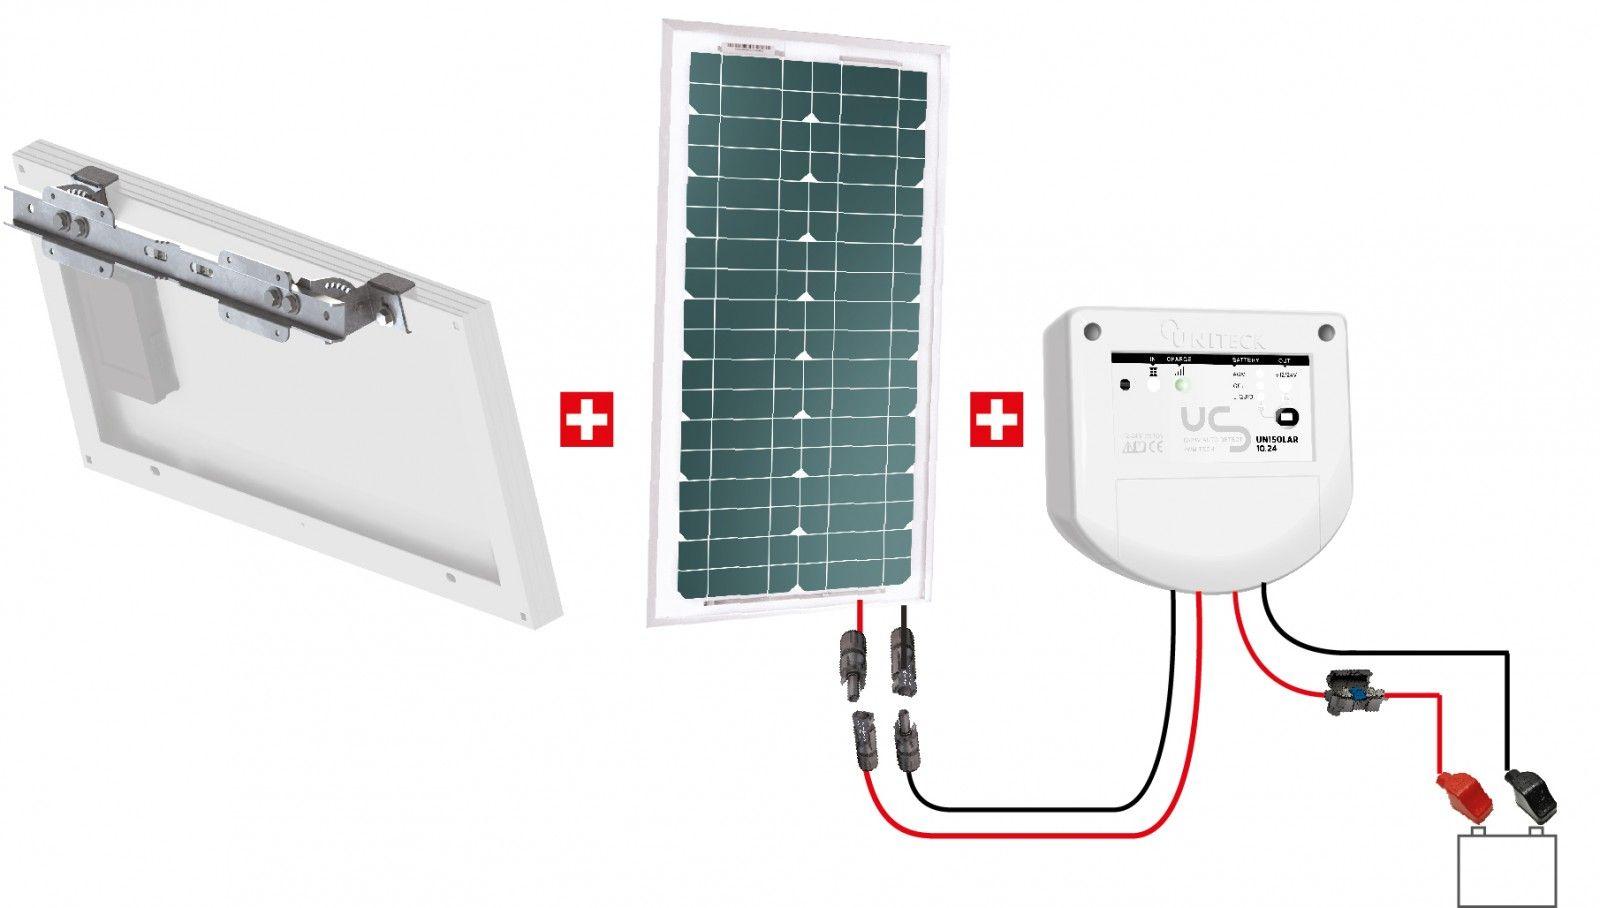 Kit motorisation portail solaire 12v uniteck 20w - Motorisation portail solaire ...